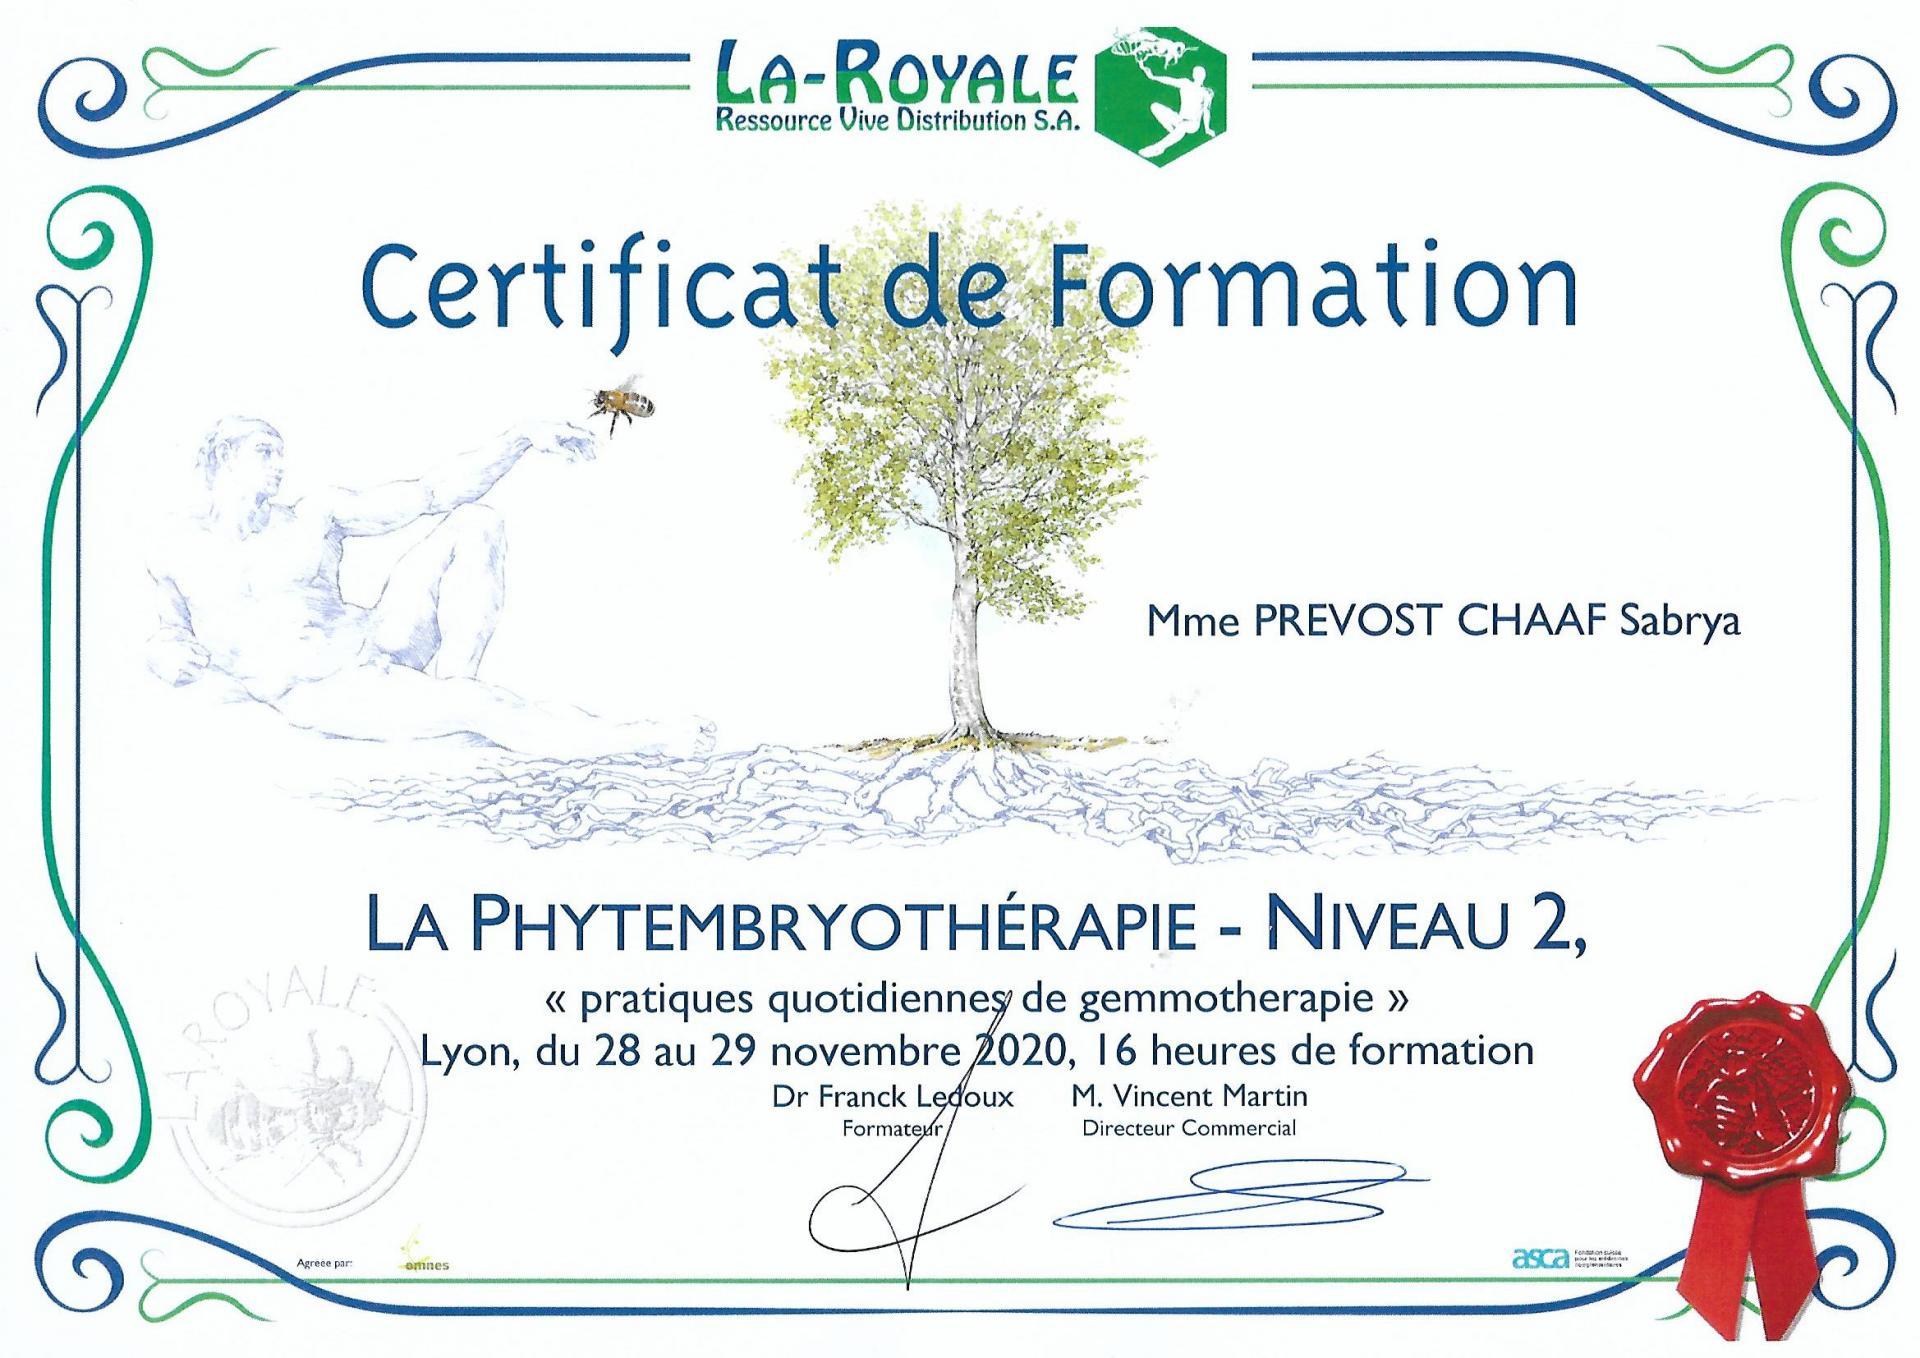 Sabrya chaaf certificat phyto embryo 2